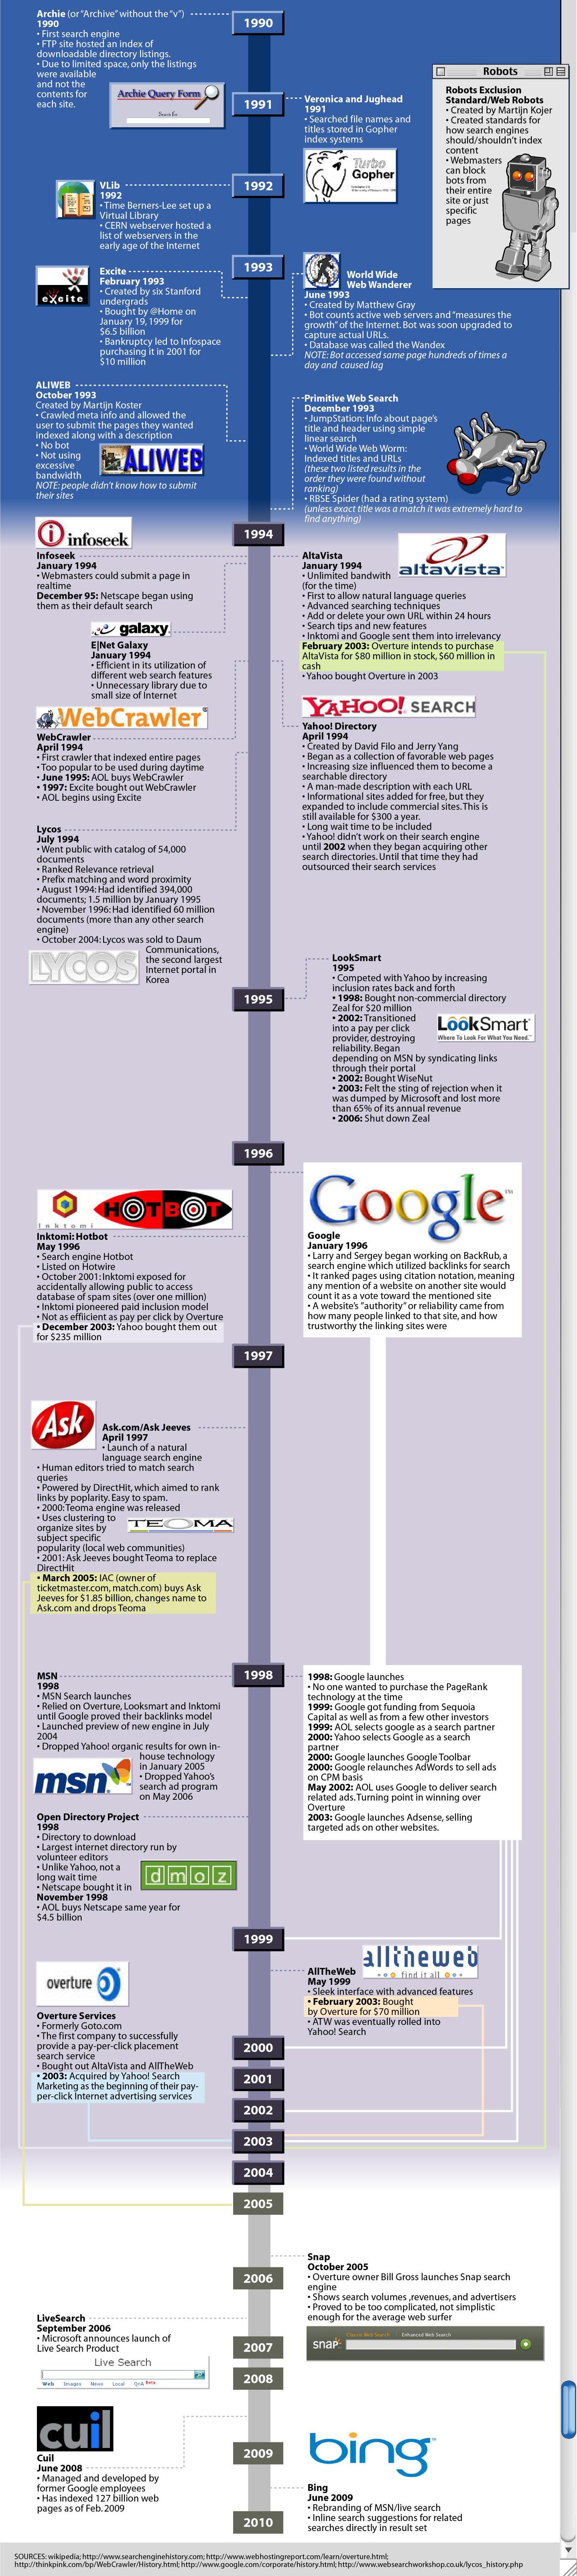 Sejarah Search Engine